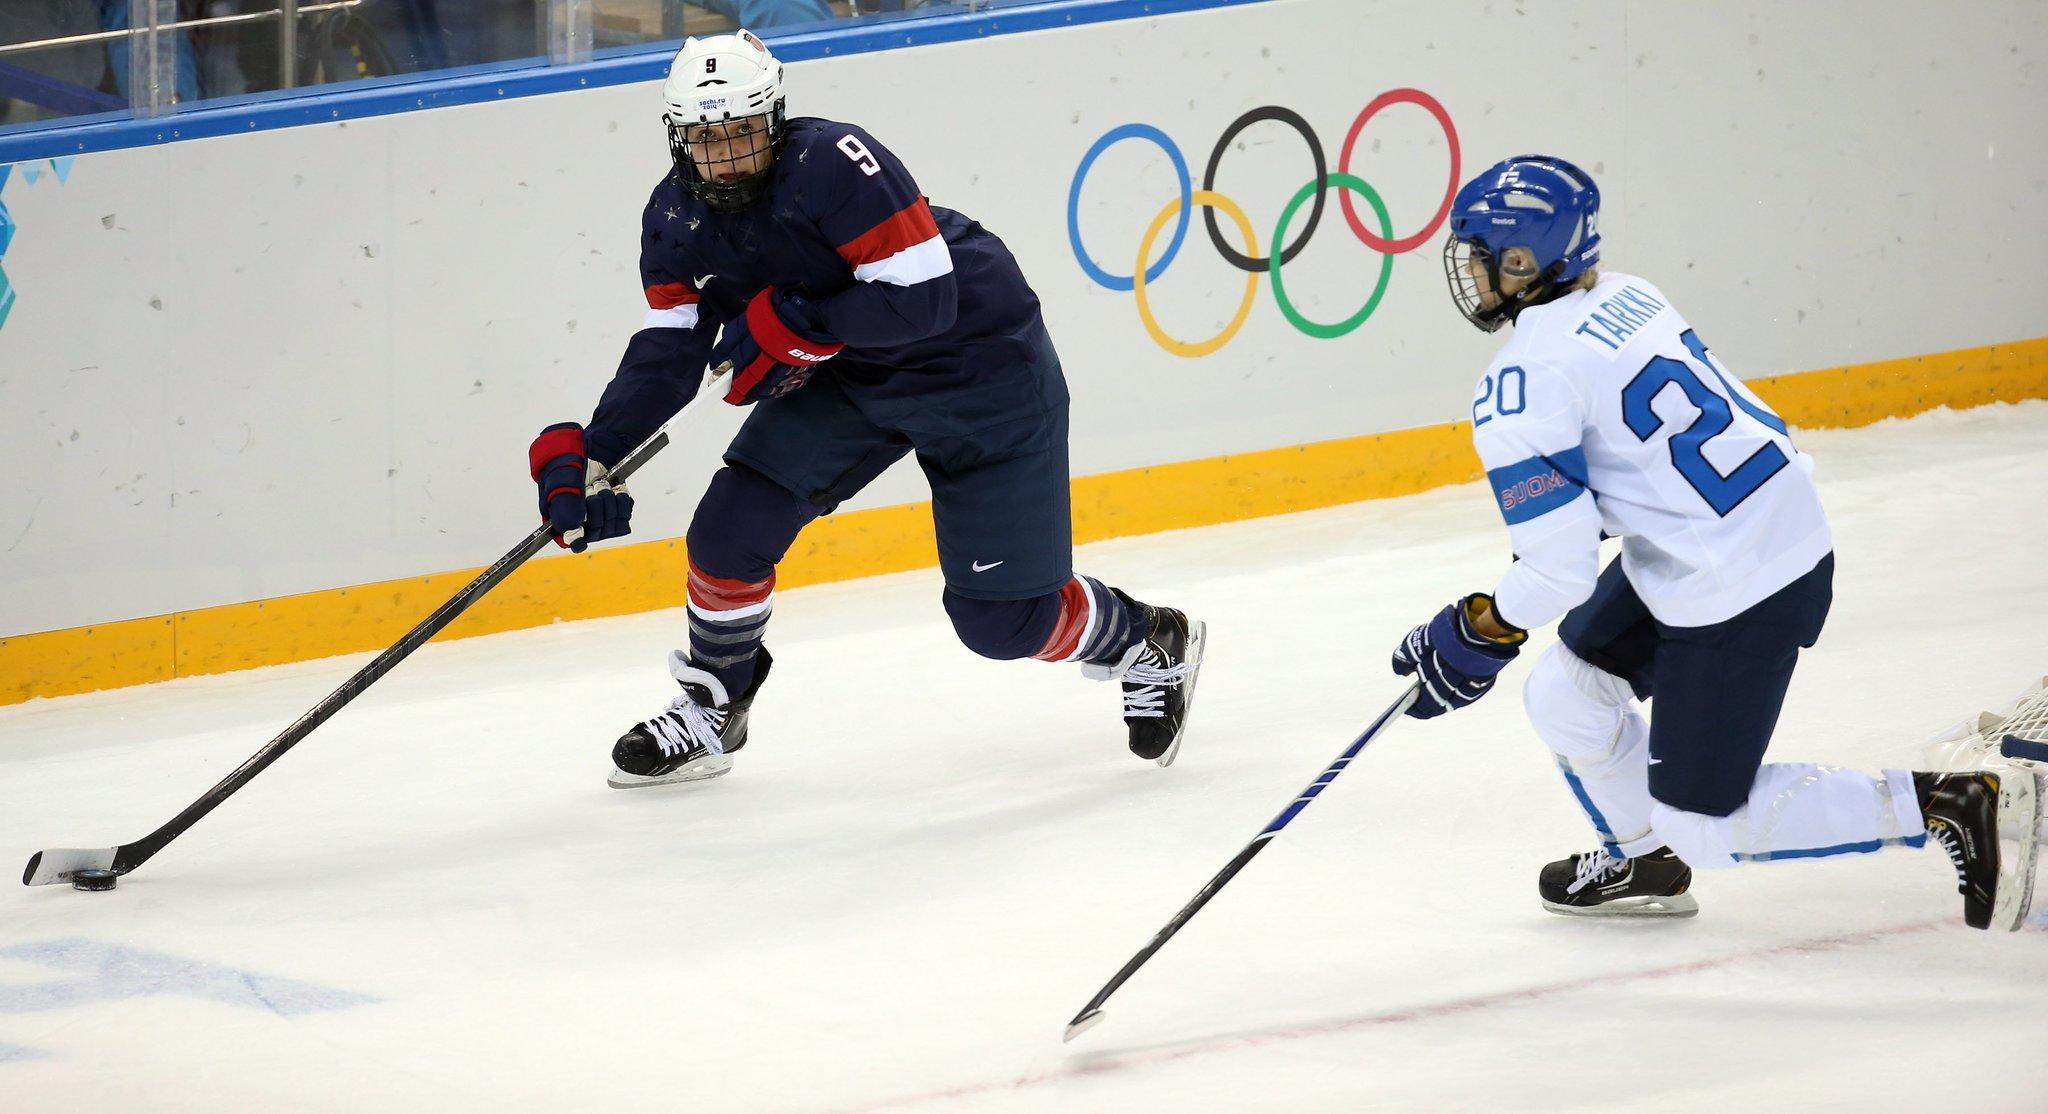 U.S. defenseman Megan Bozek (9) looks to pass against Finland defenseman Saija Tarkki (20) during the first perio.